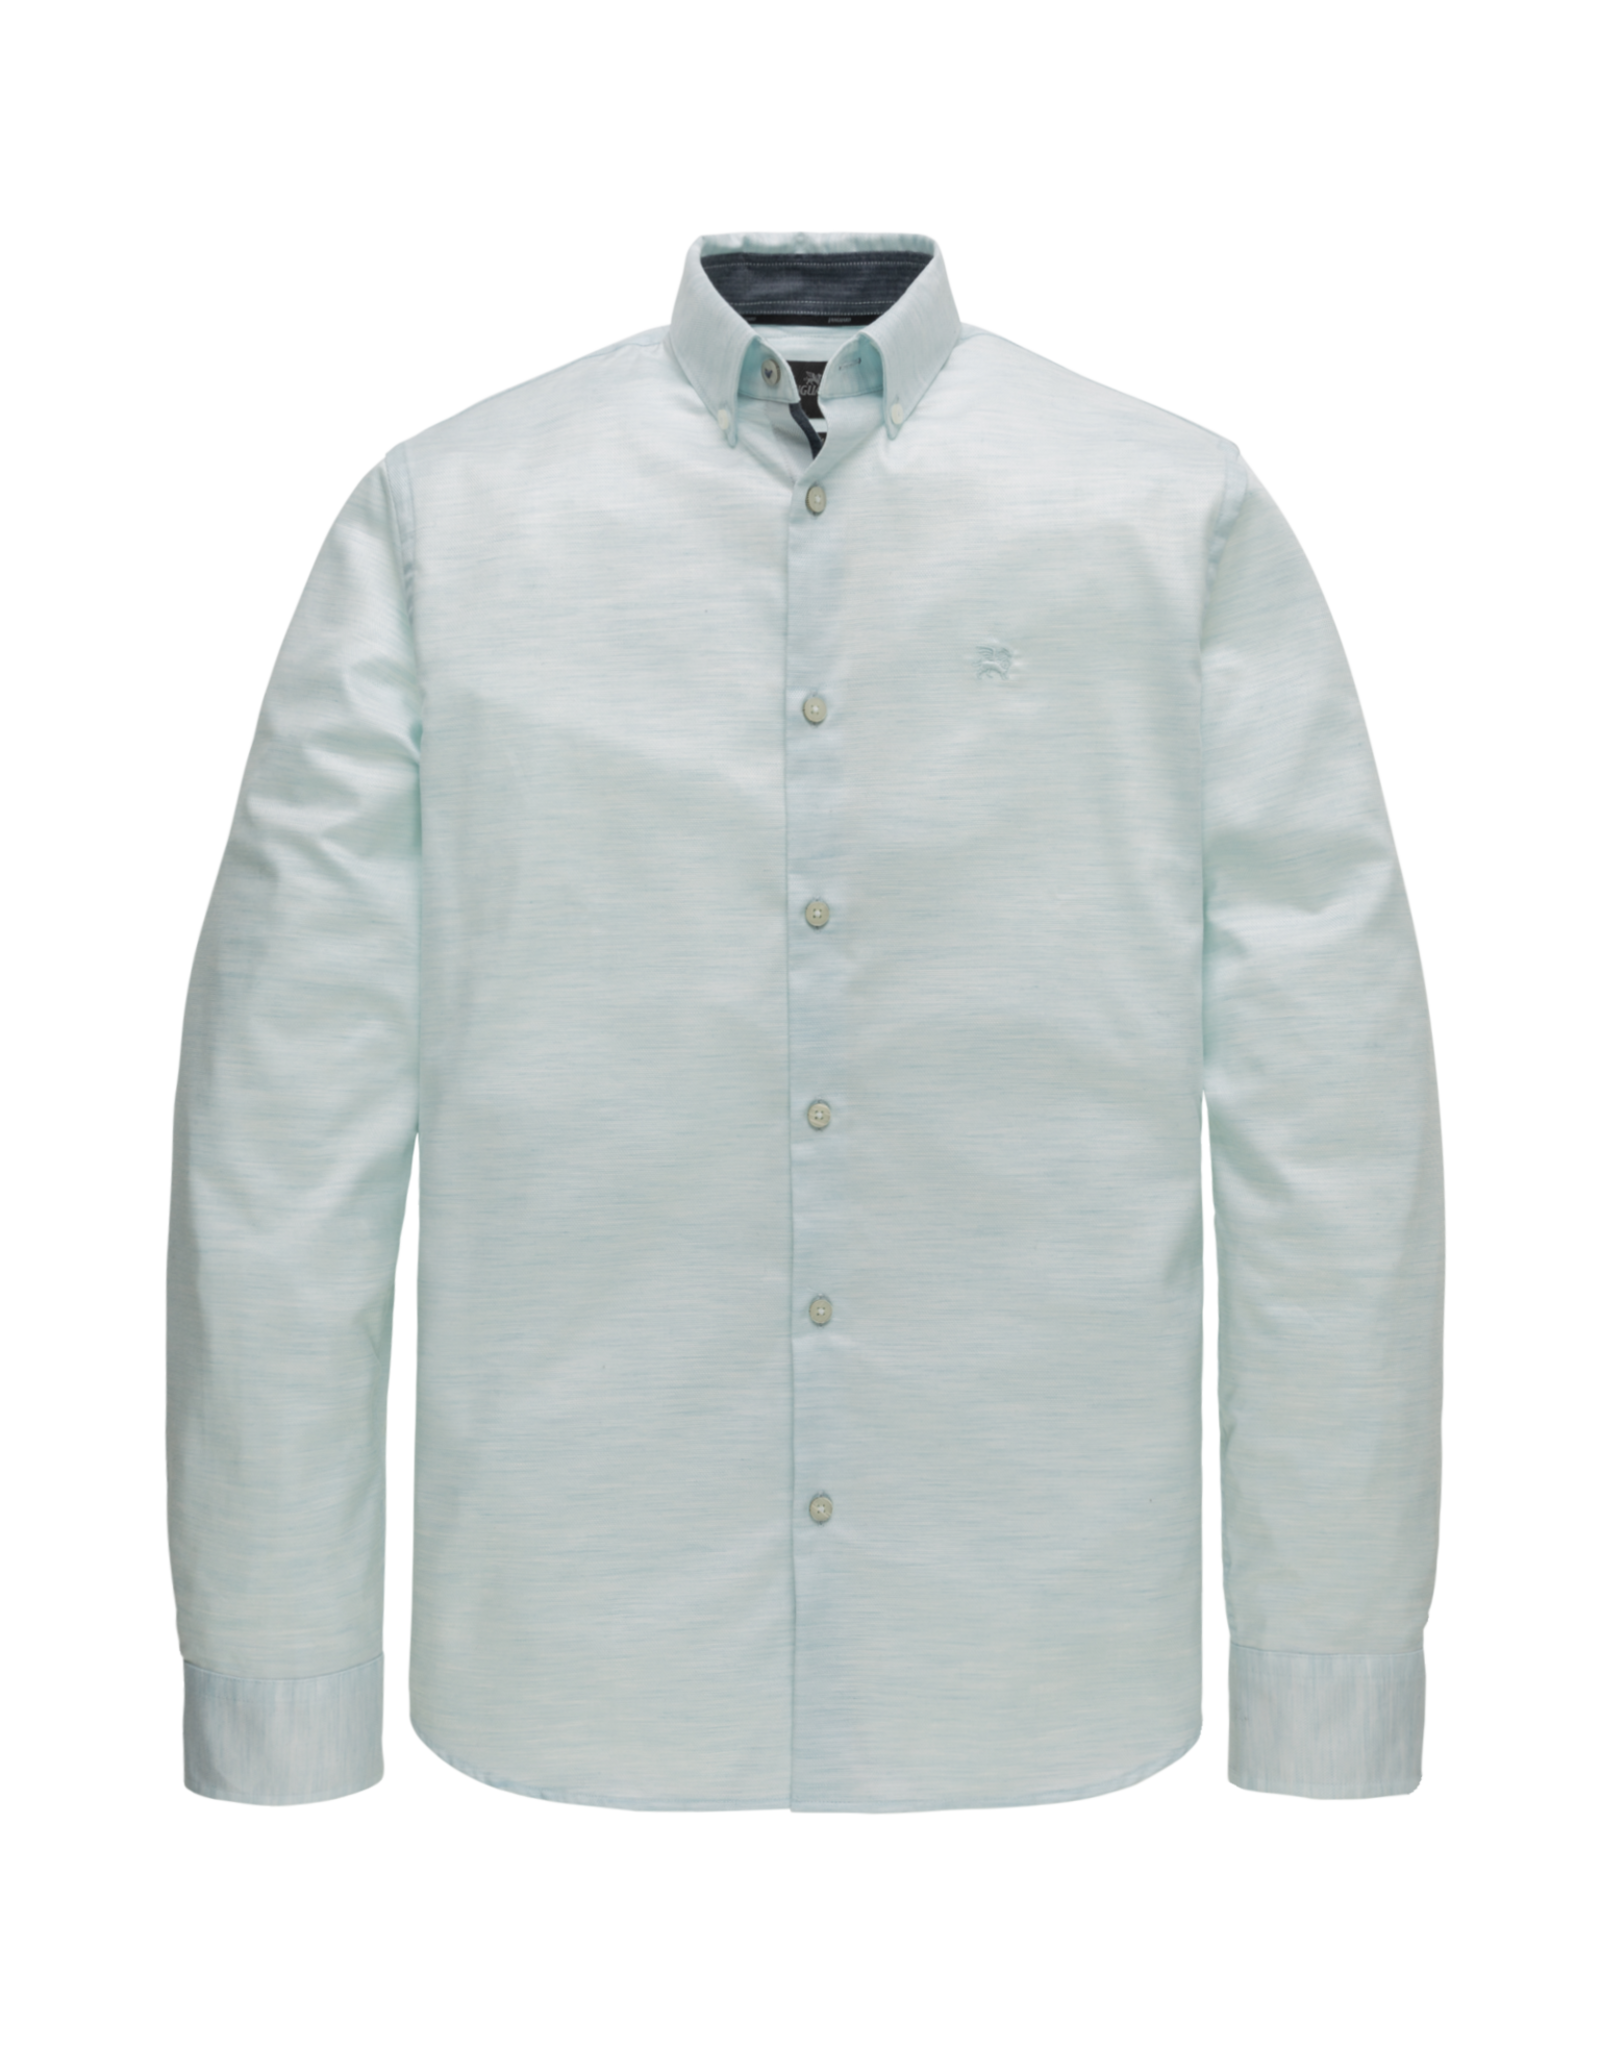 Vanguard Vanguard l/s shirt structured melange stretch sea green